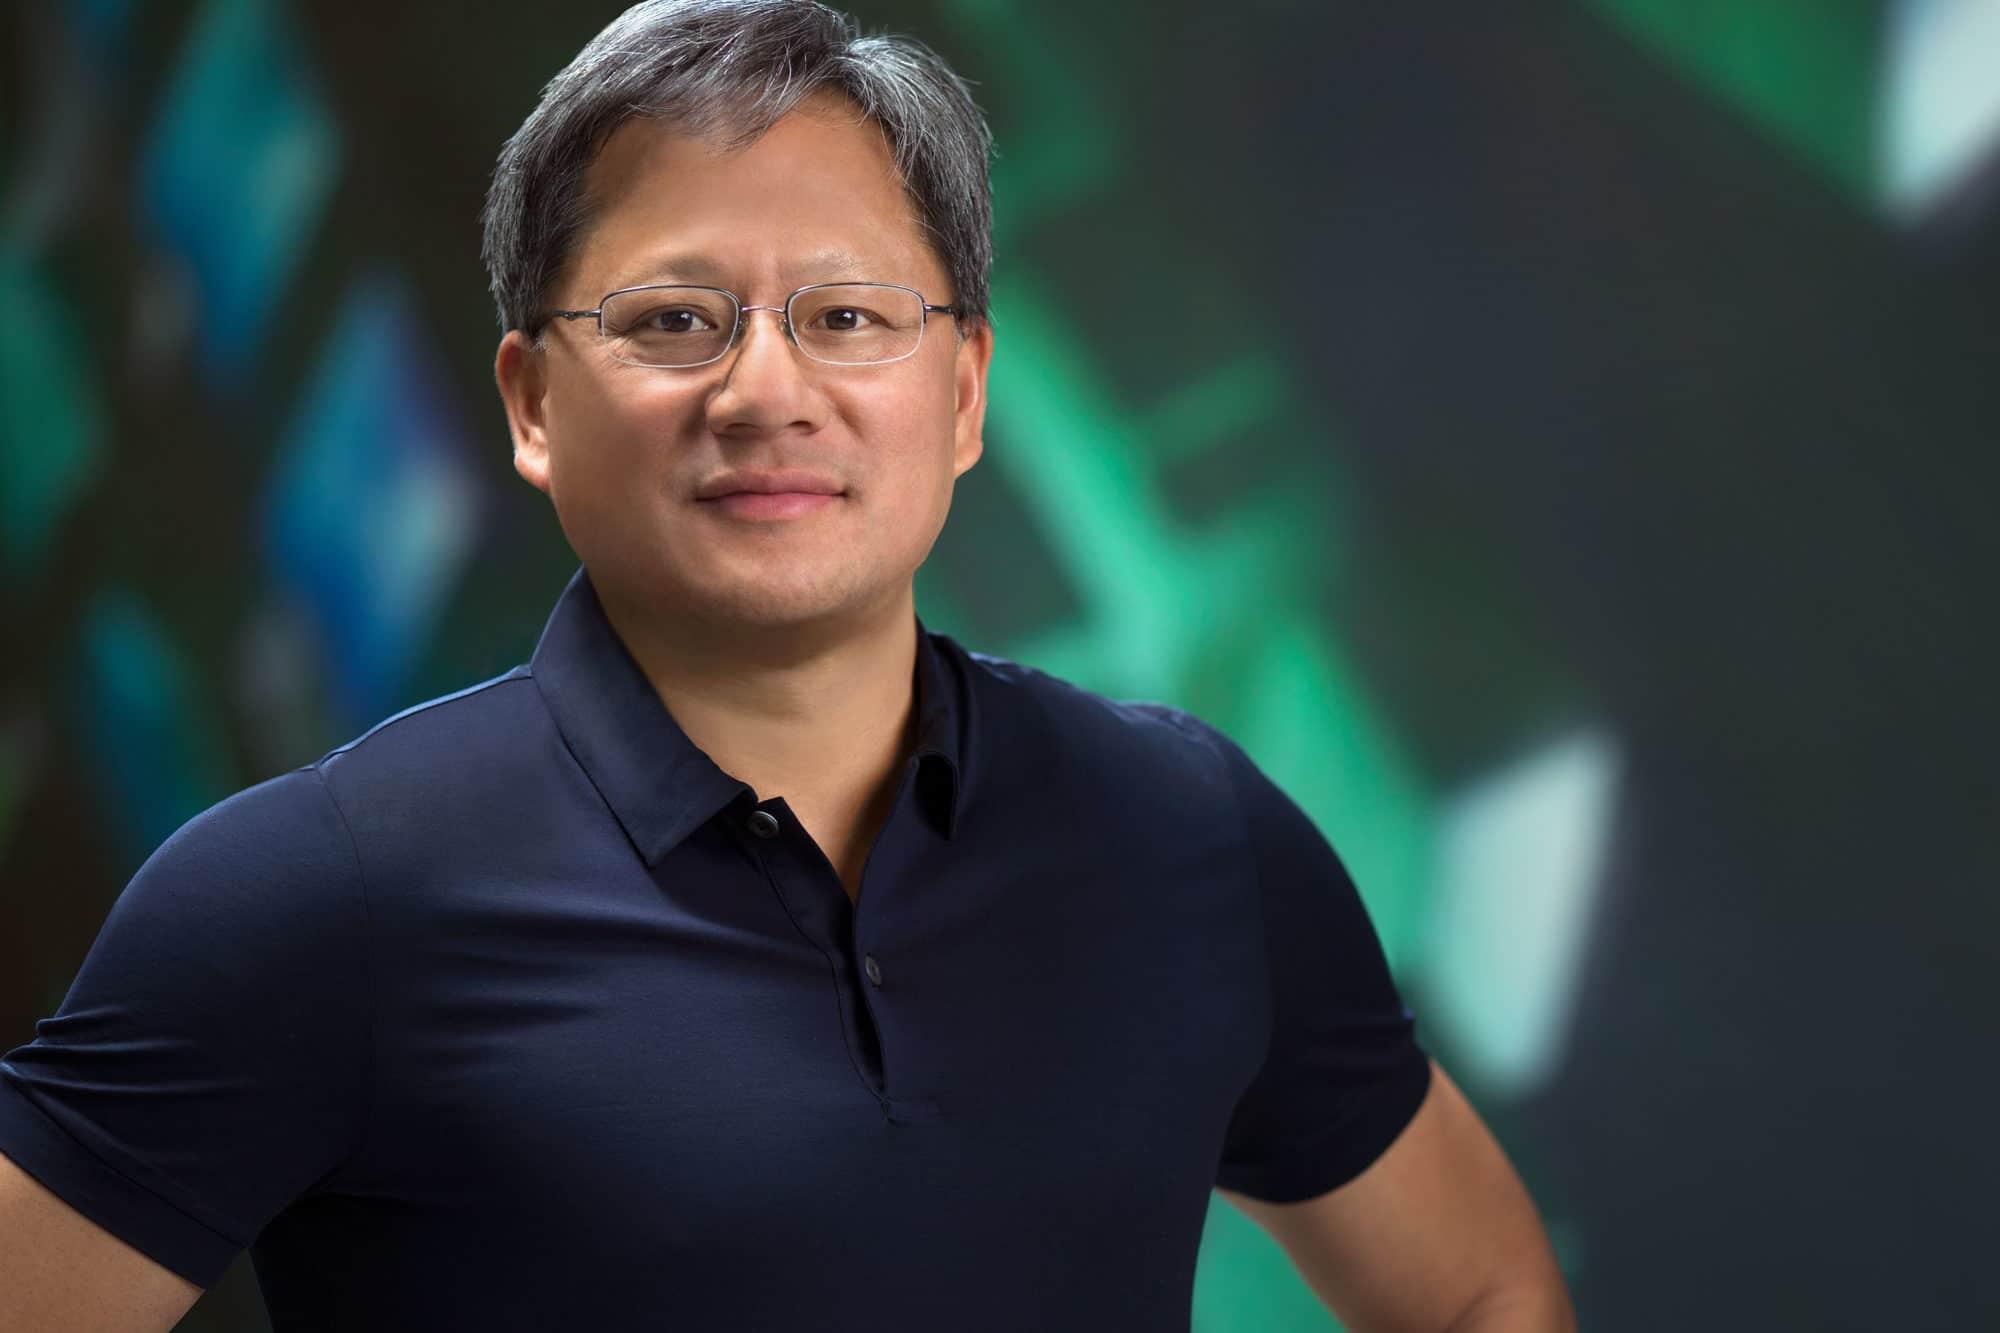 NVIDIA 執行長黃仁勳先生將於 SC15 年會談論加速運算技術的展望。